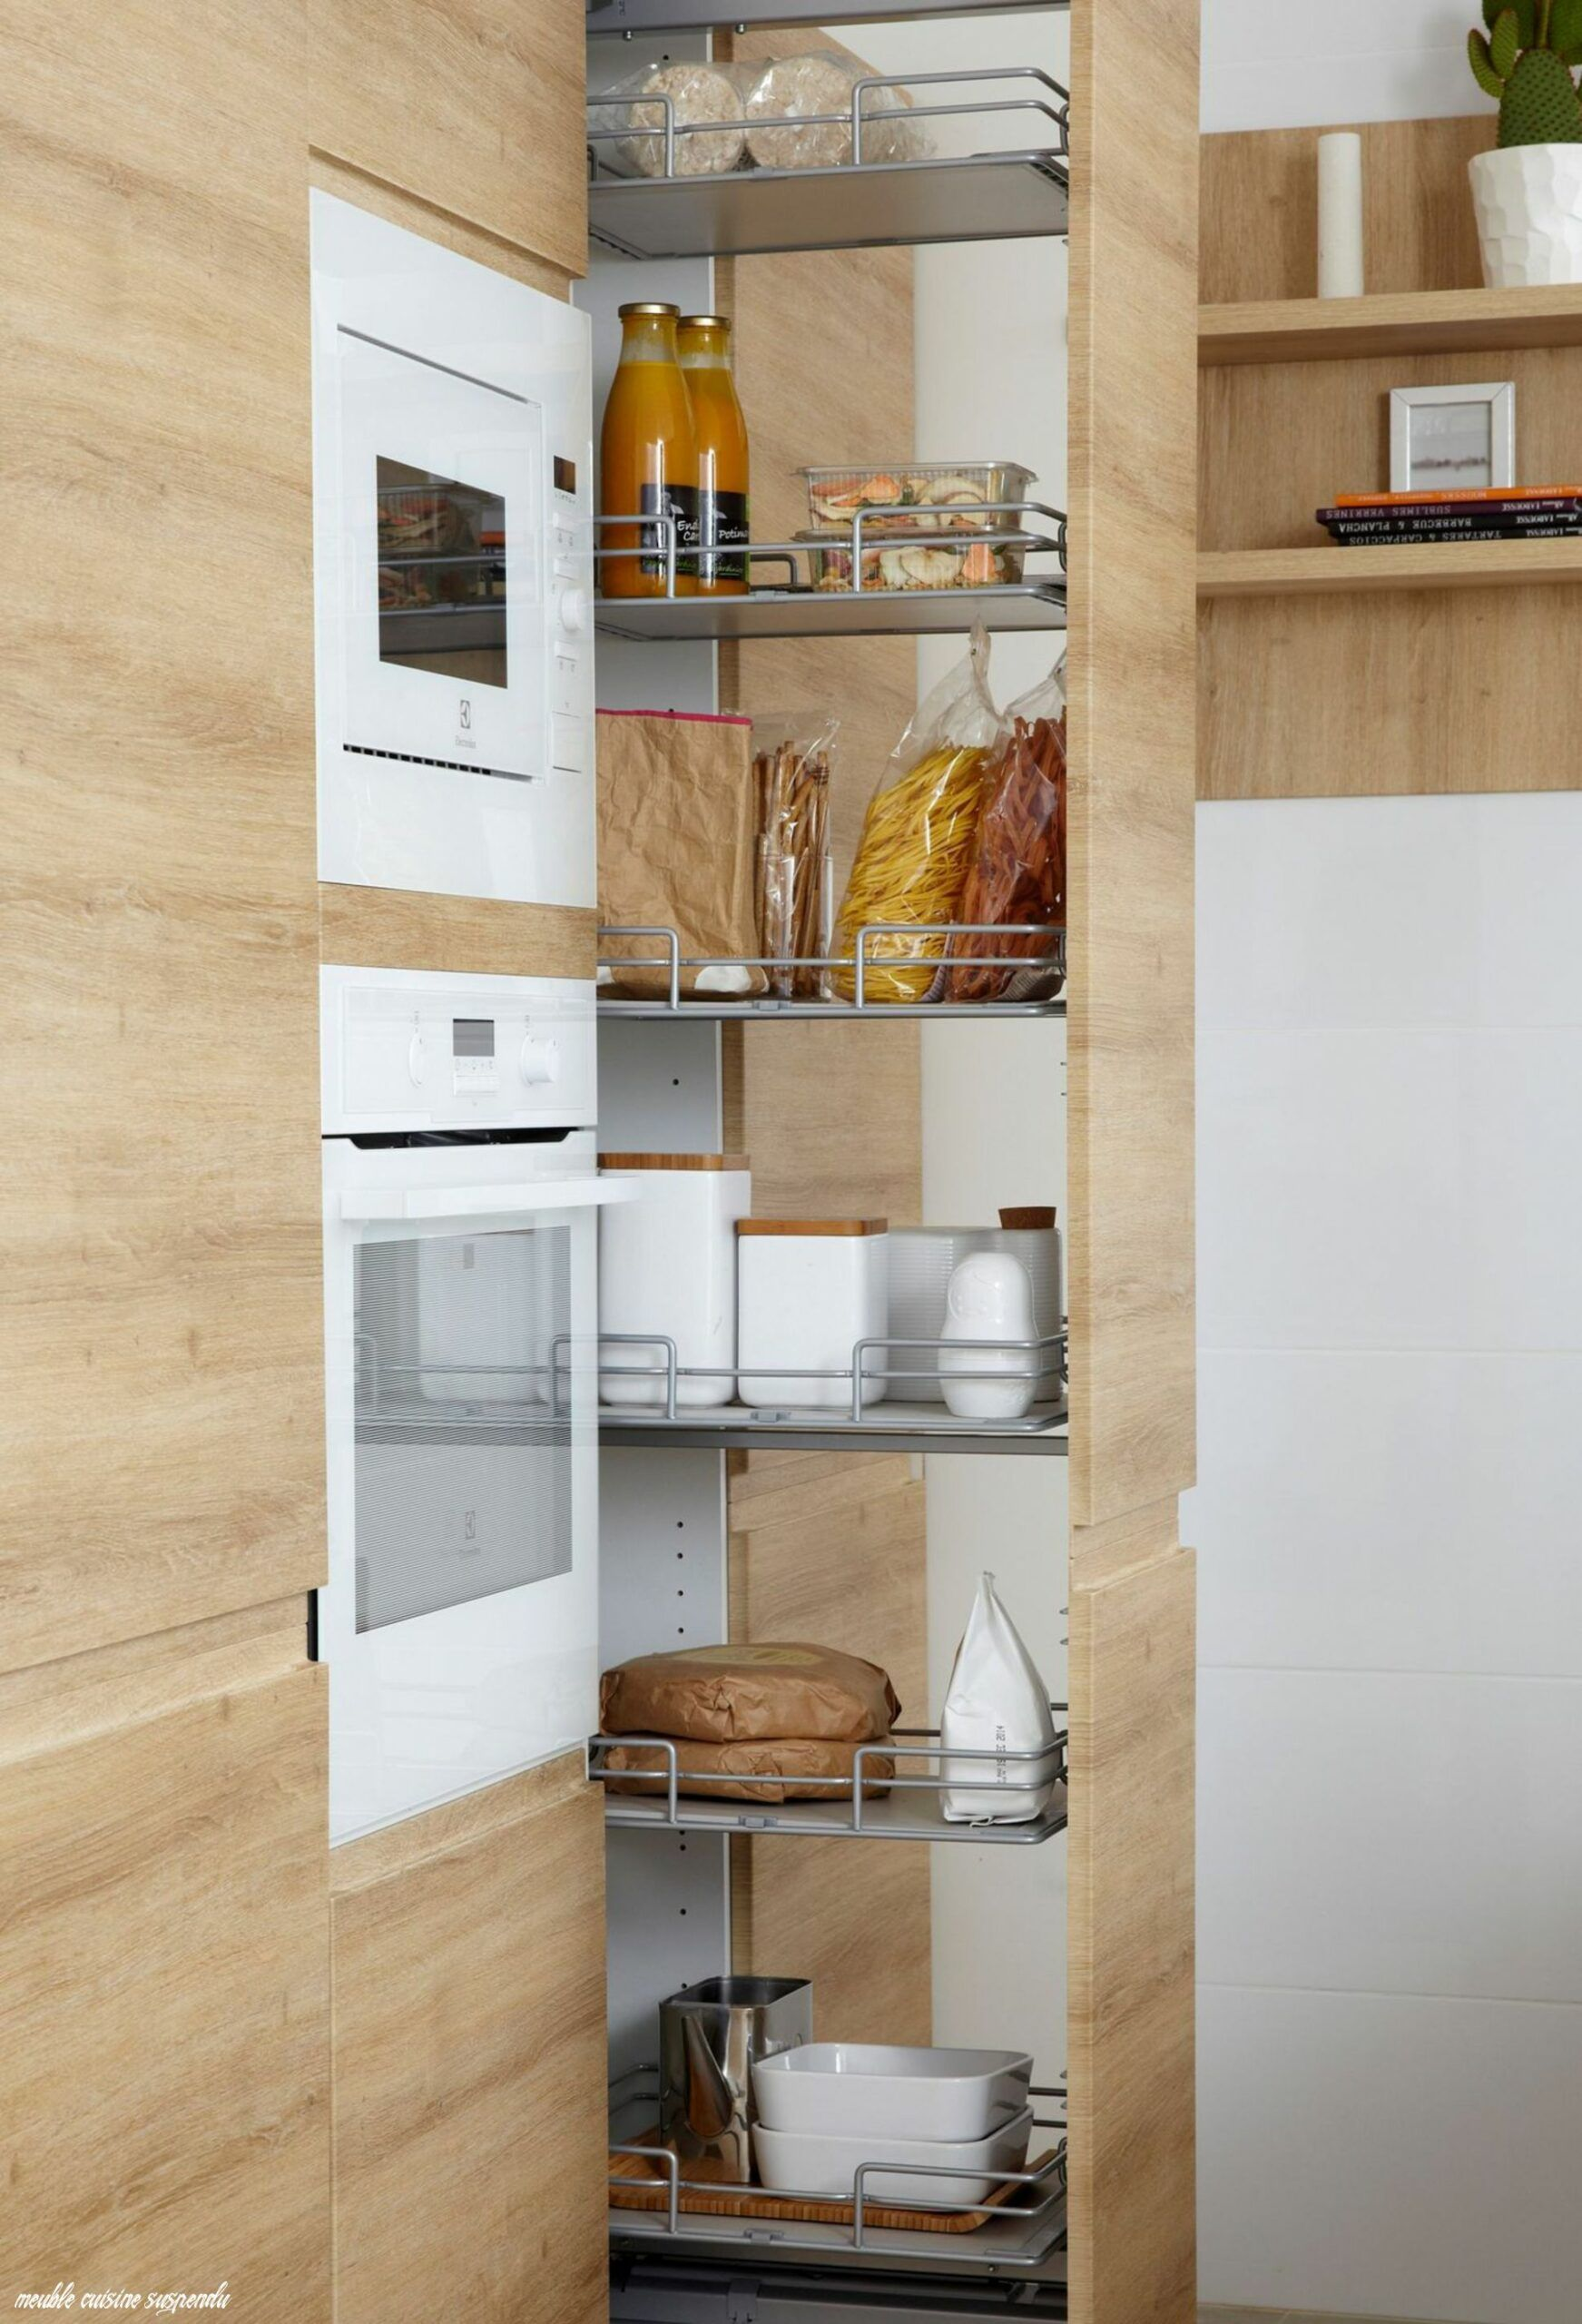 7 Meuble Cuisine Suspendu En 2020 Meuble Haut Cuisine Idee Rangement Cuisine Hauteur Meuble Haut Cuisine